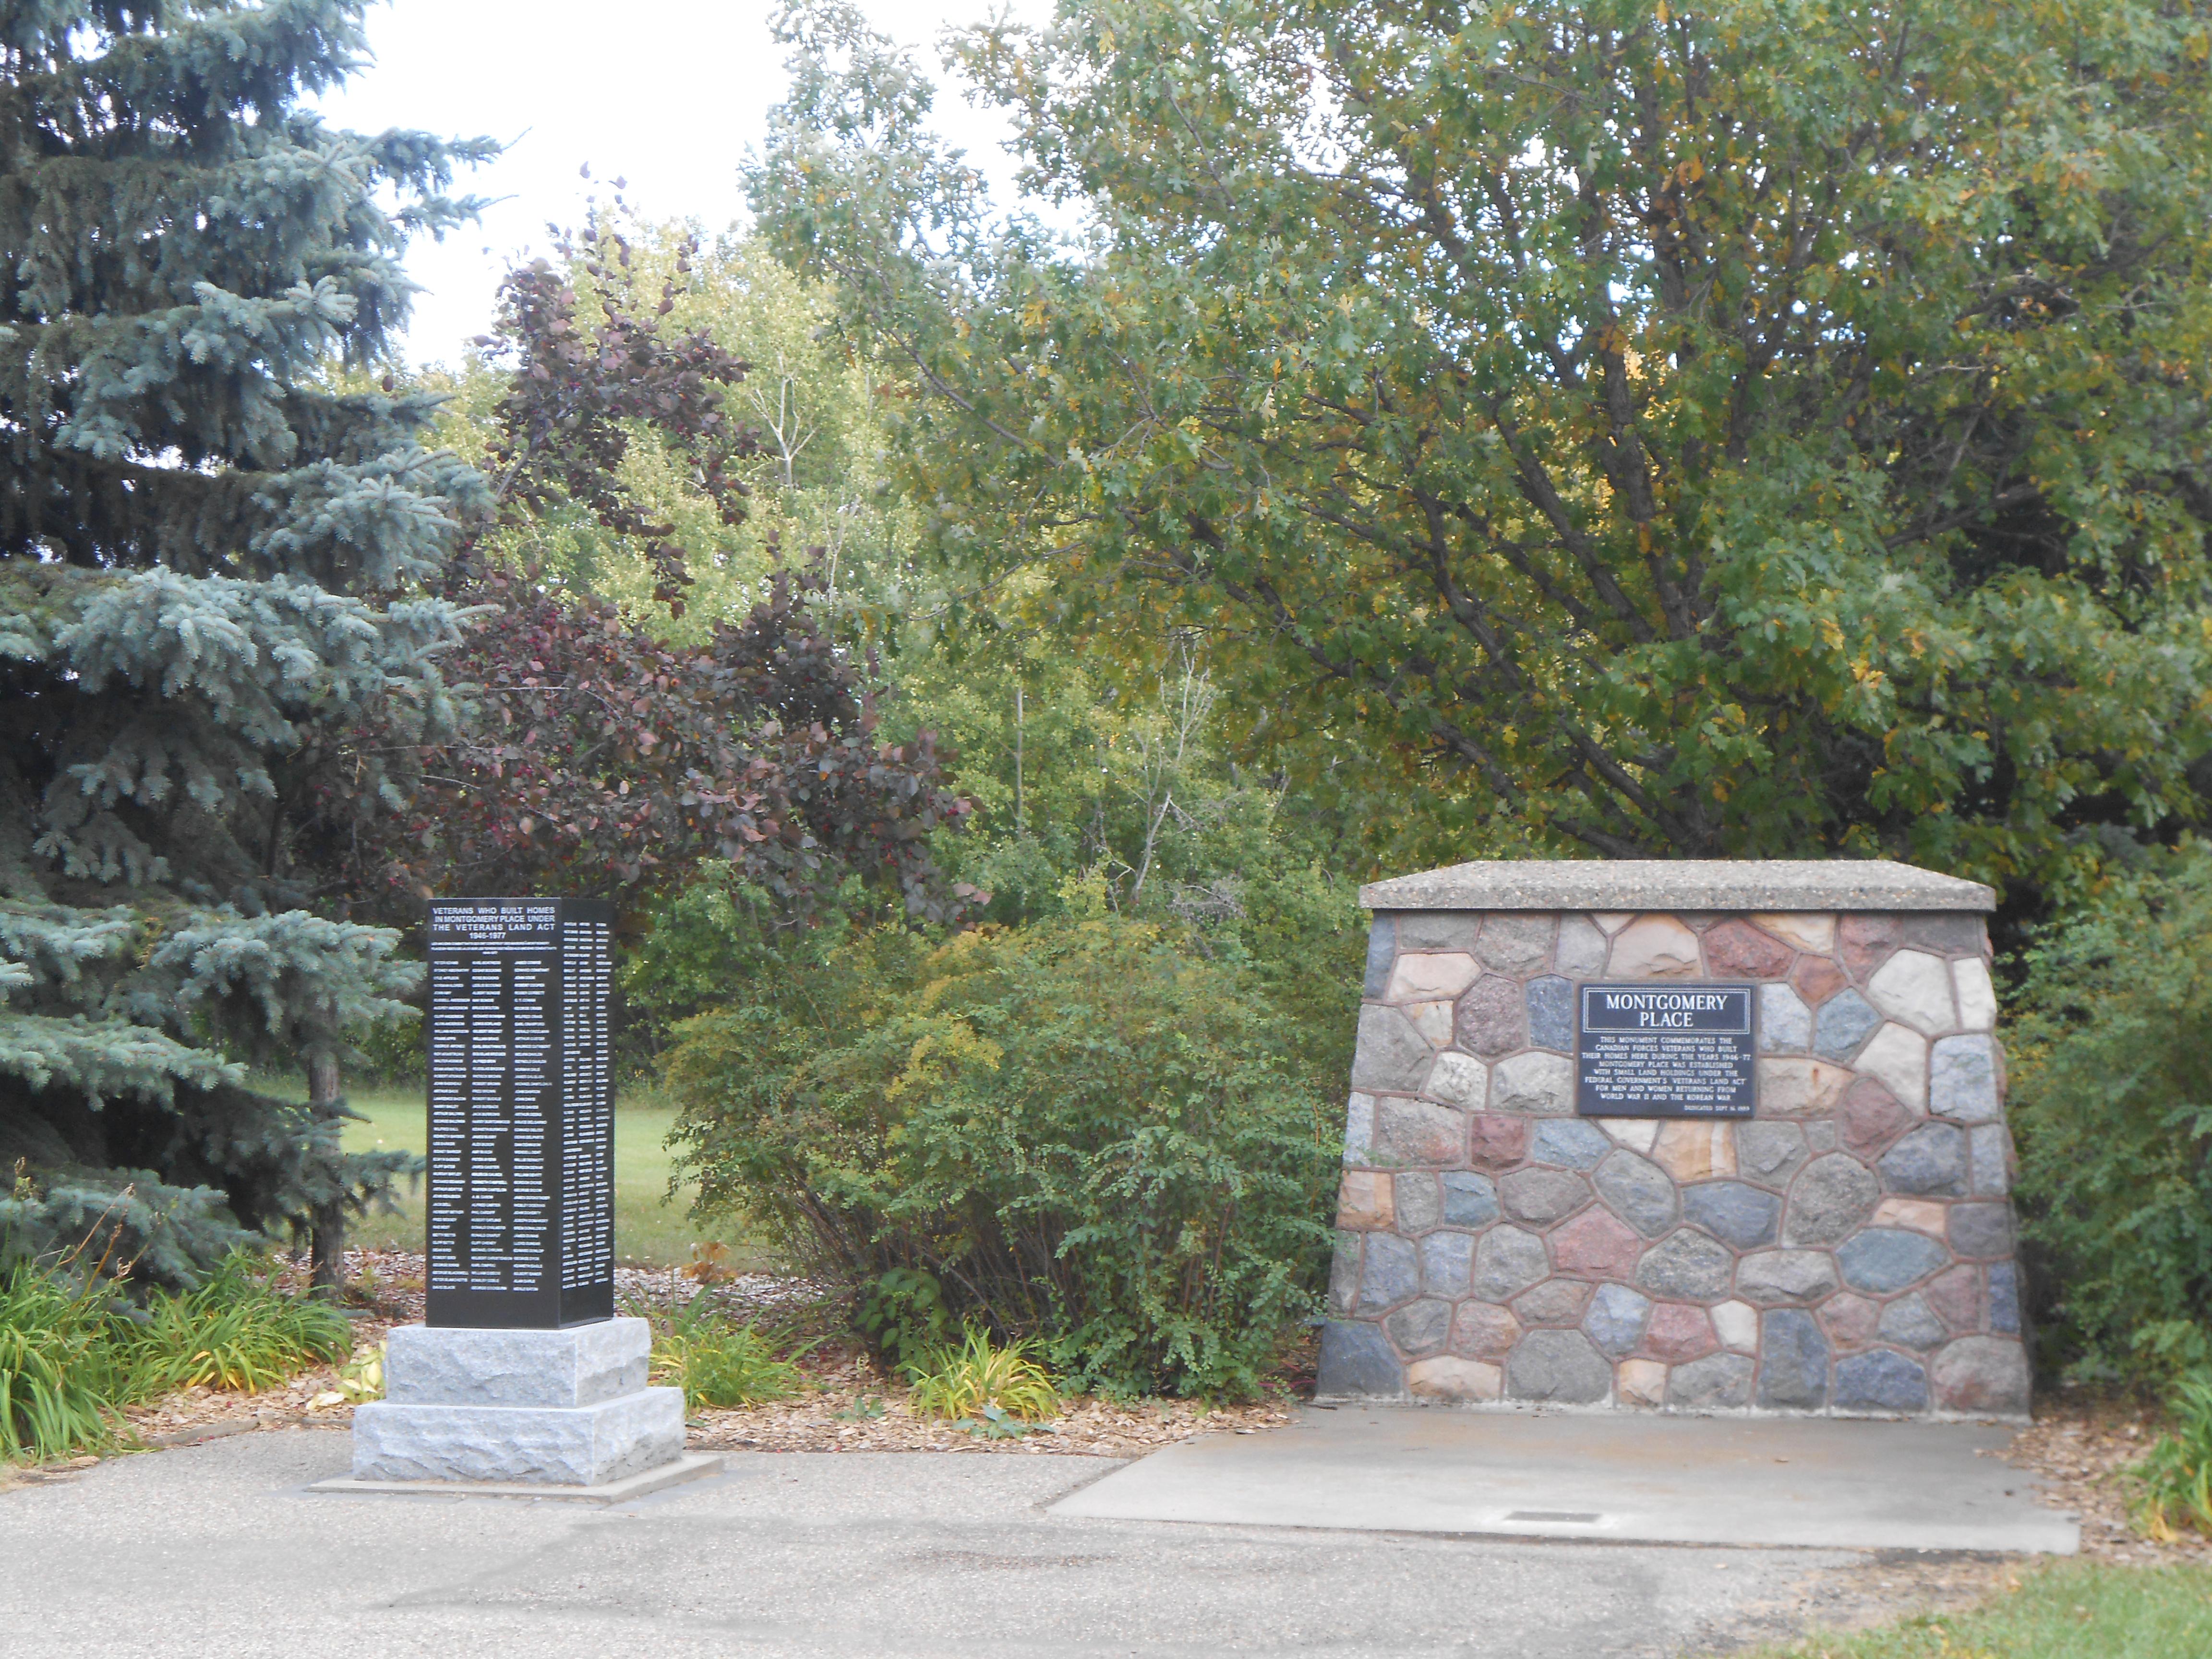 Montgomery Place Monuments, Saskatoon, Saskatchewan